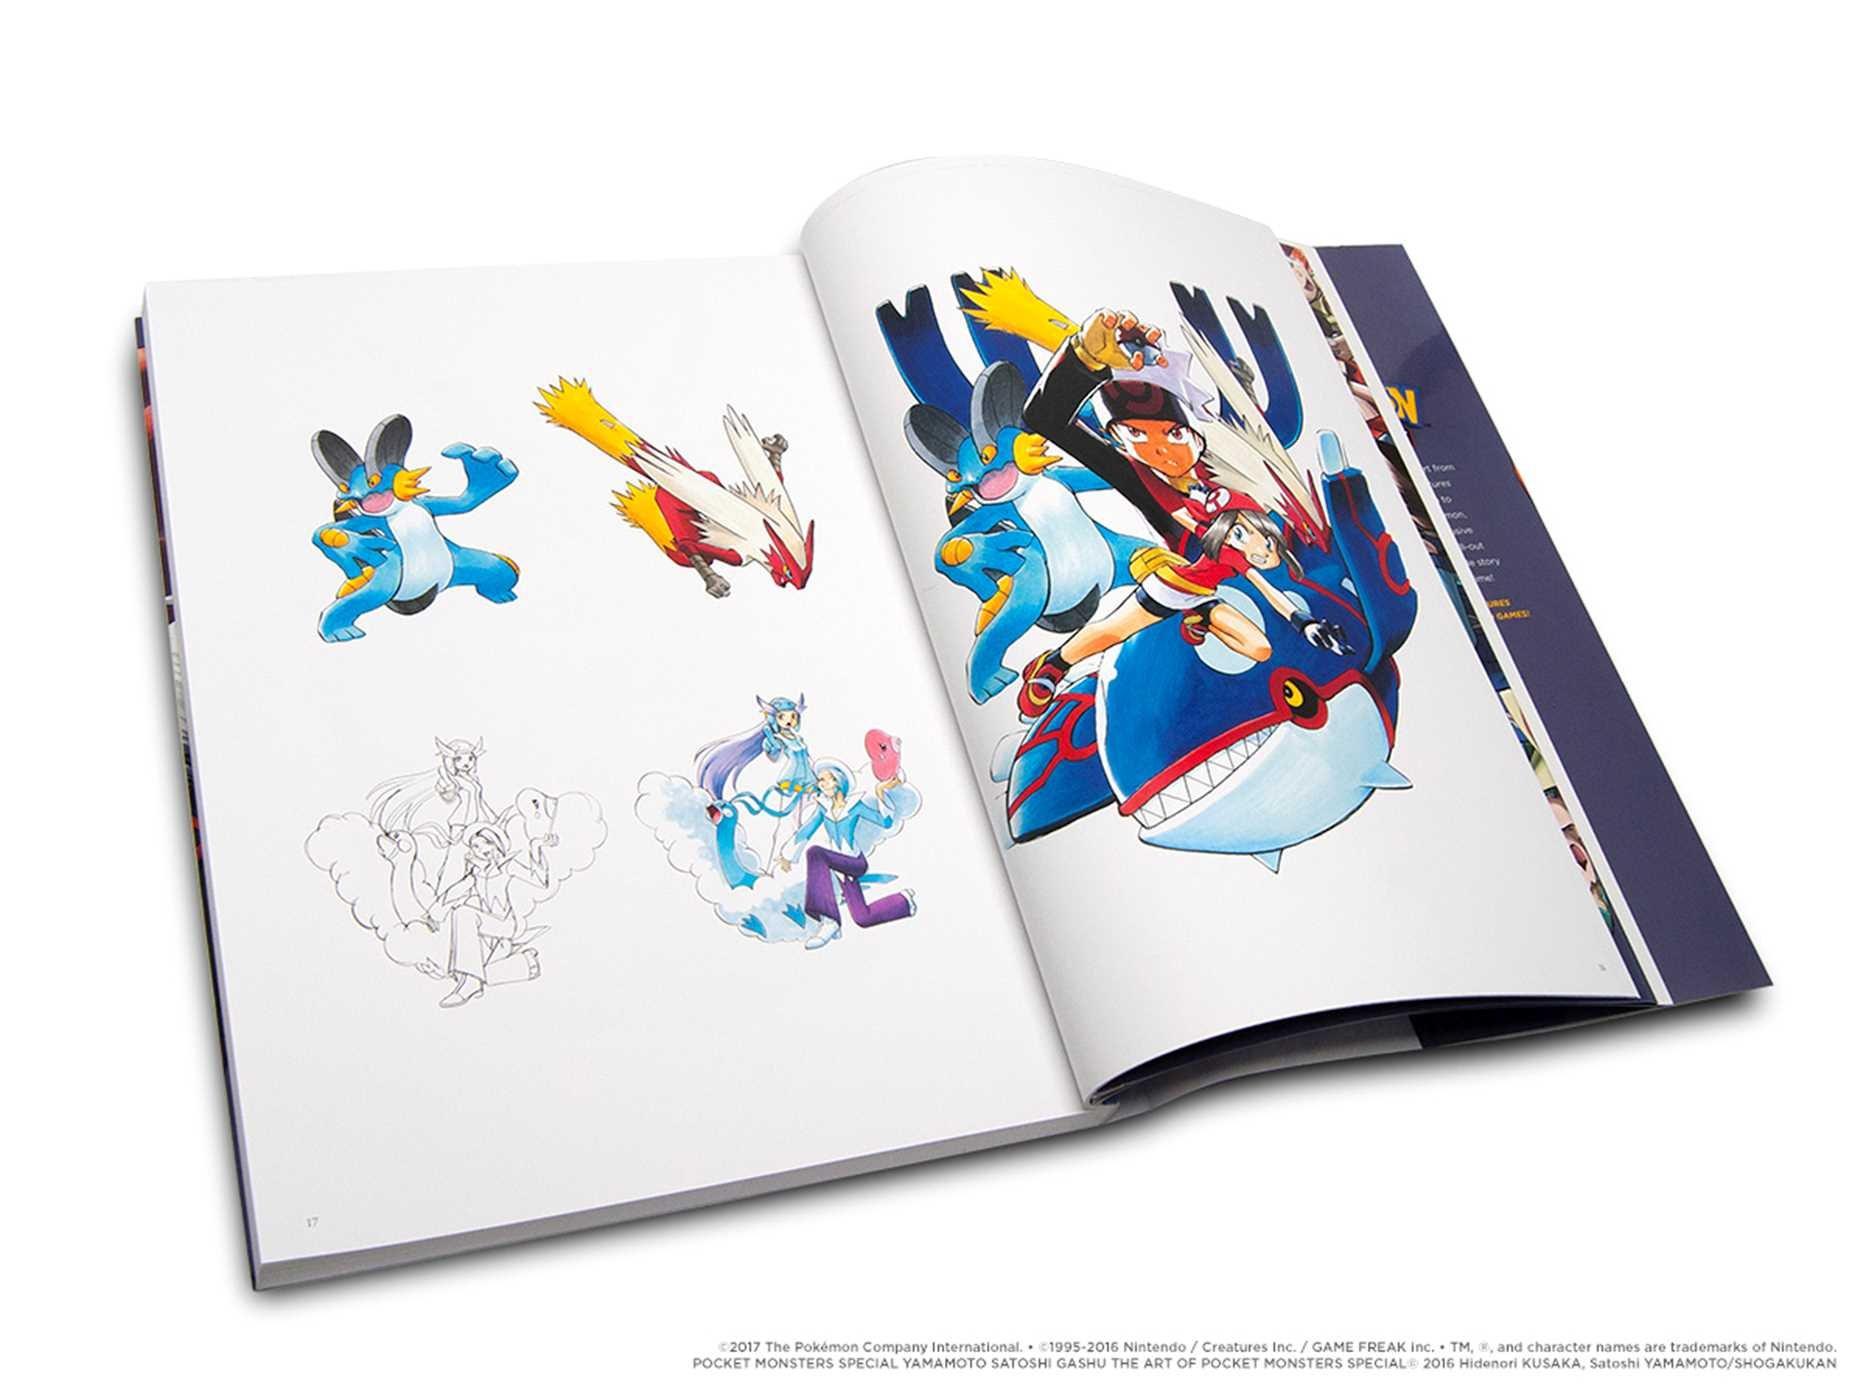 Pokémon Adventures 20th Anniversary Illustration Book: The Art of Pokémon Adventures (Pokemon)